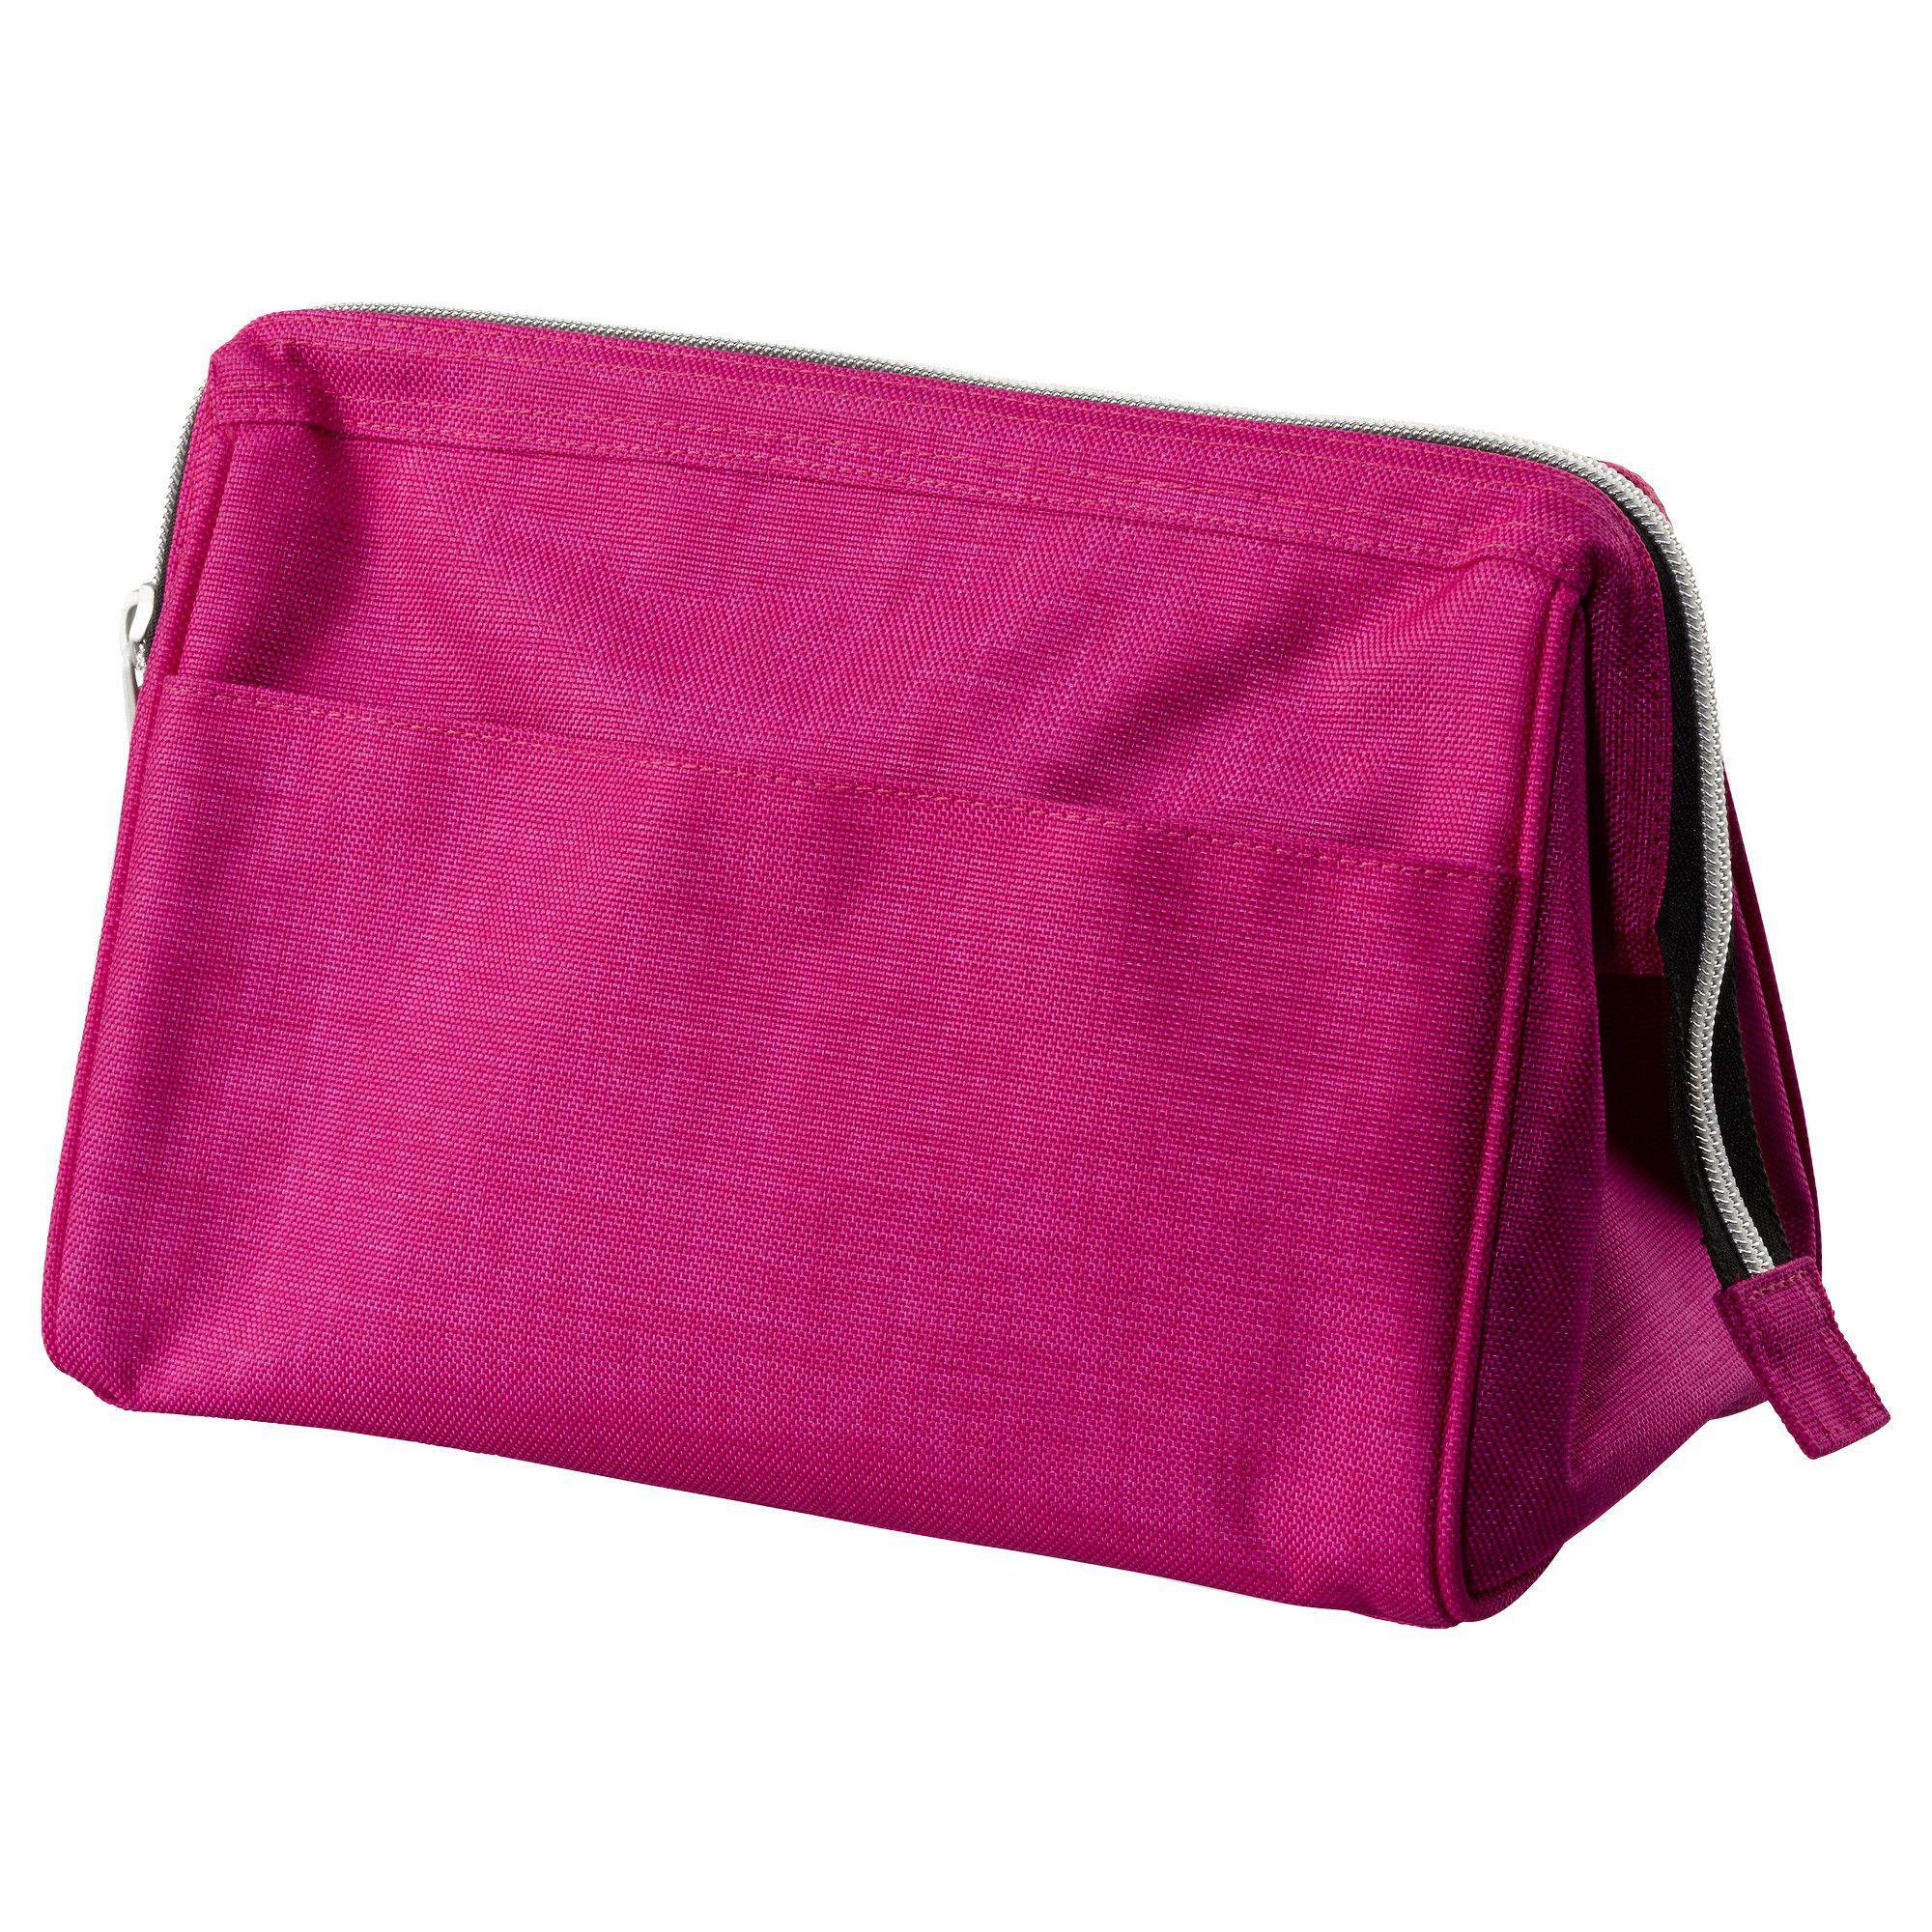 UPPTÄCKA Toiletries bag - pink - IKEA   5   e85859dd6de24